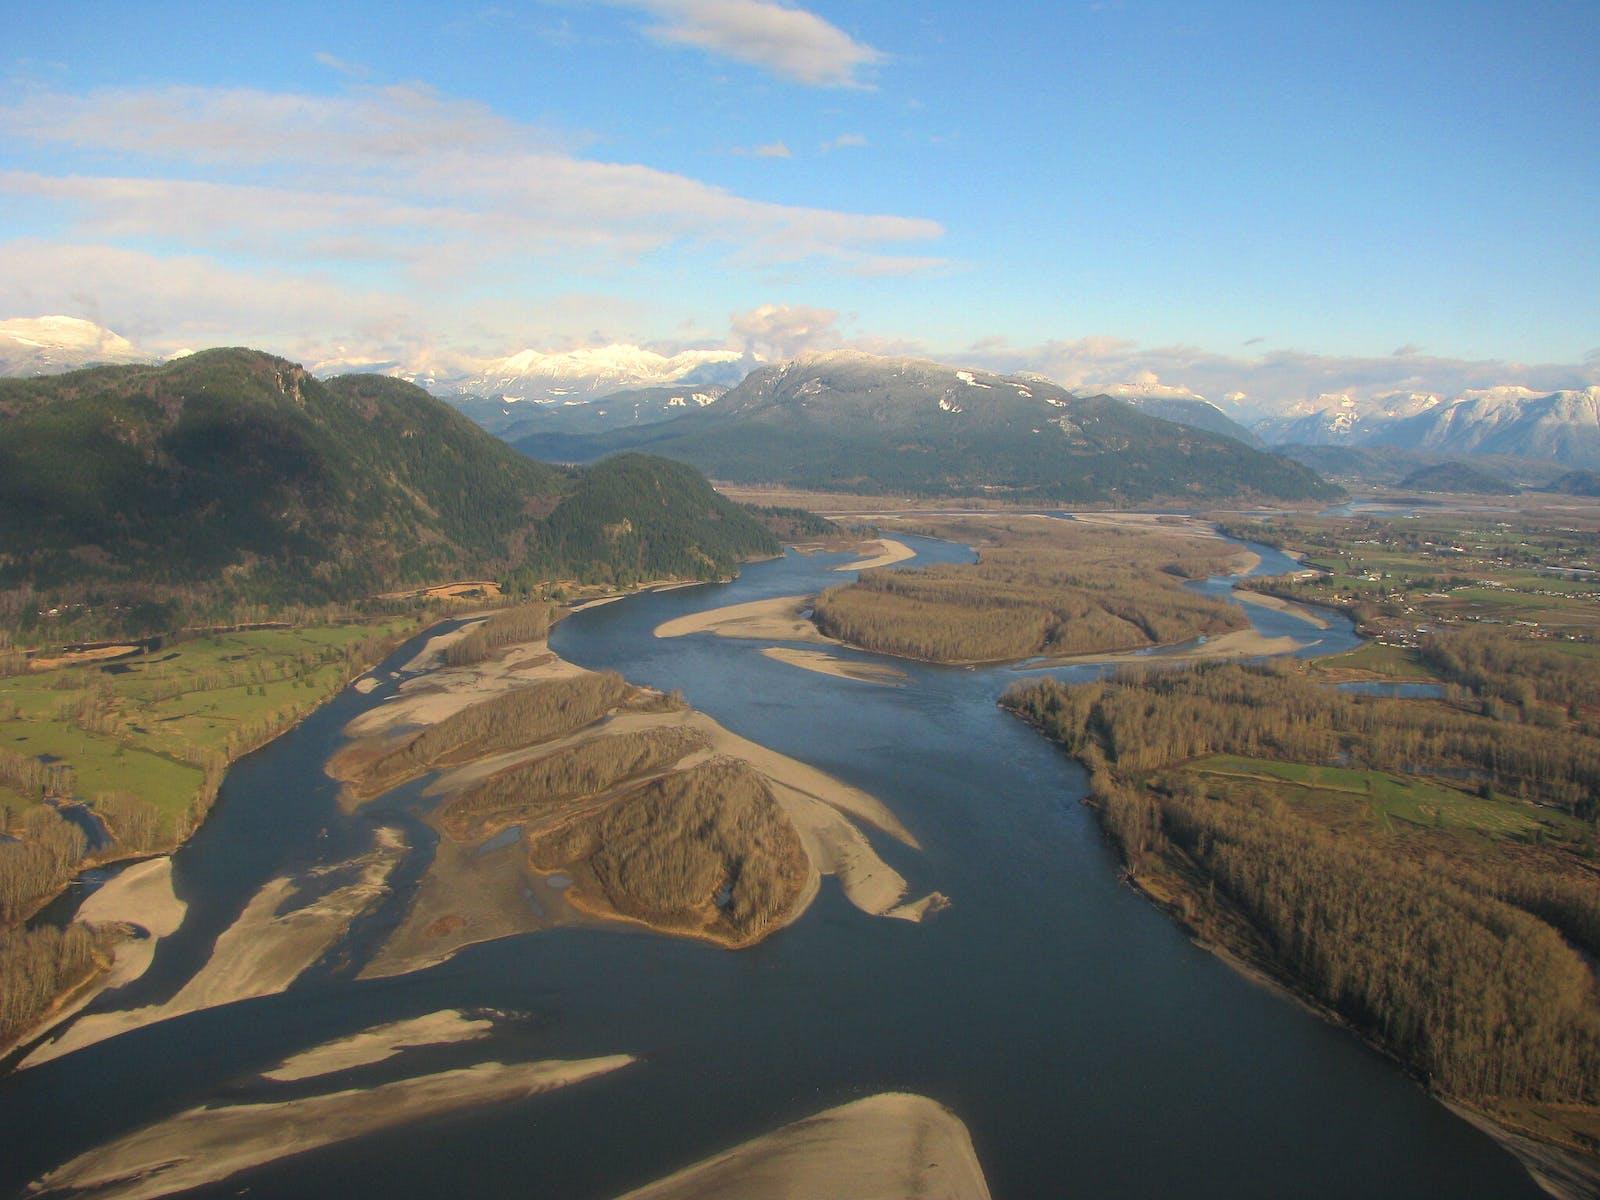 Fraser Plateau and Basin Conifer Forests